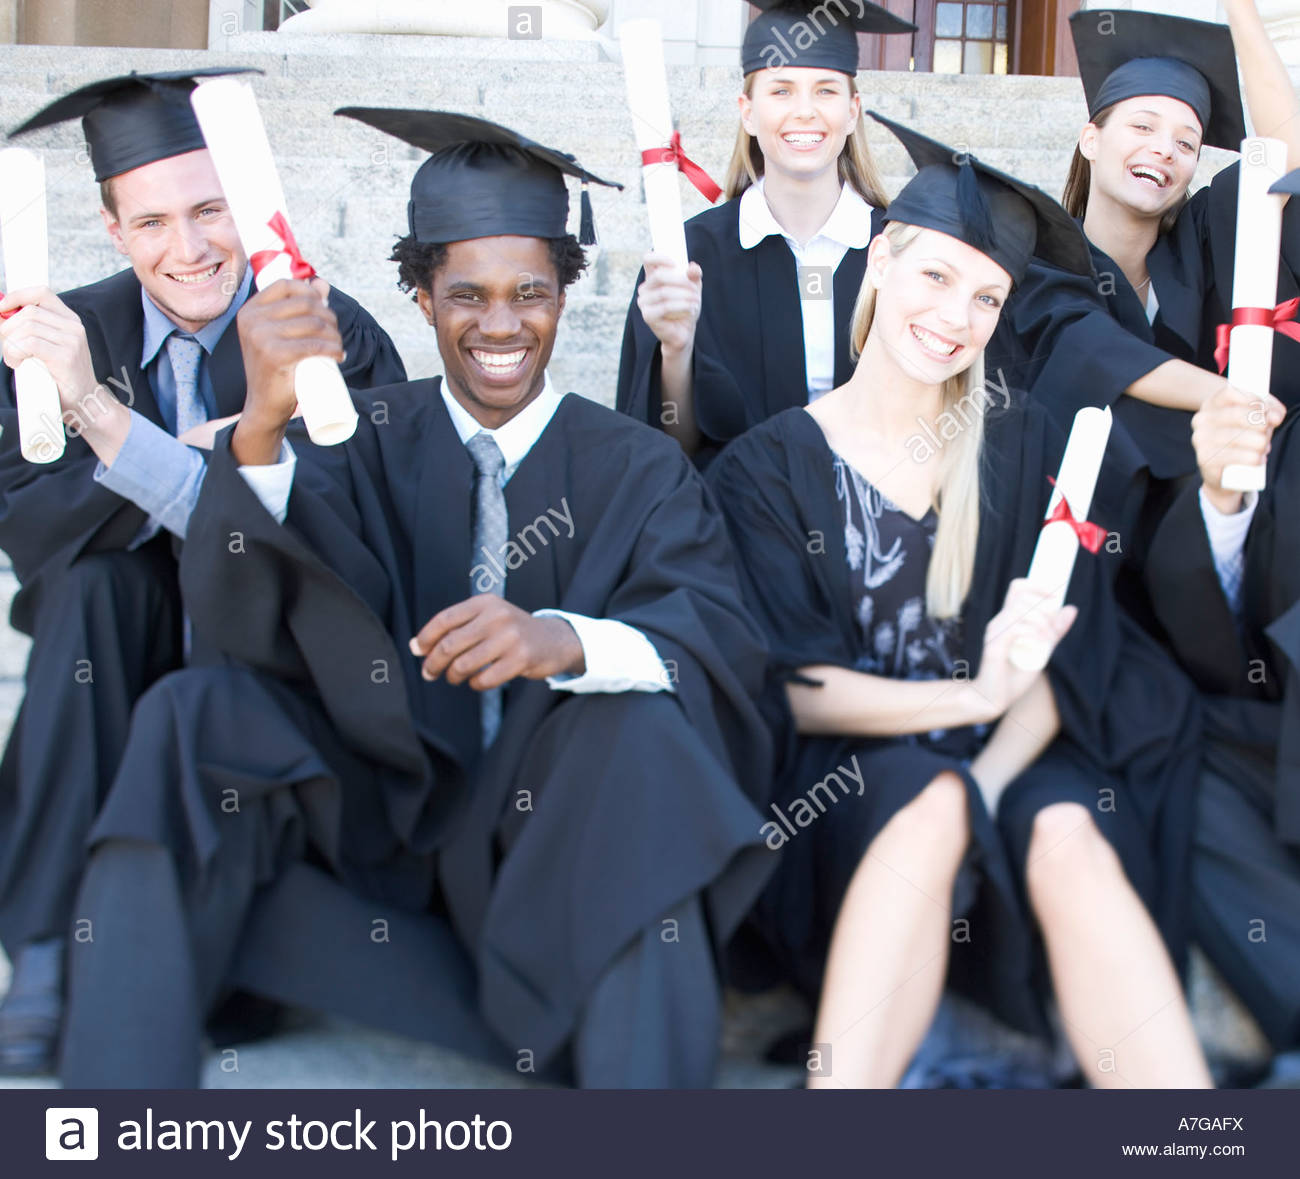 Un grupo de graduados celebrando Imagen De Stock